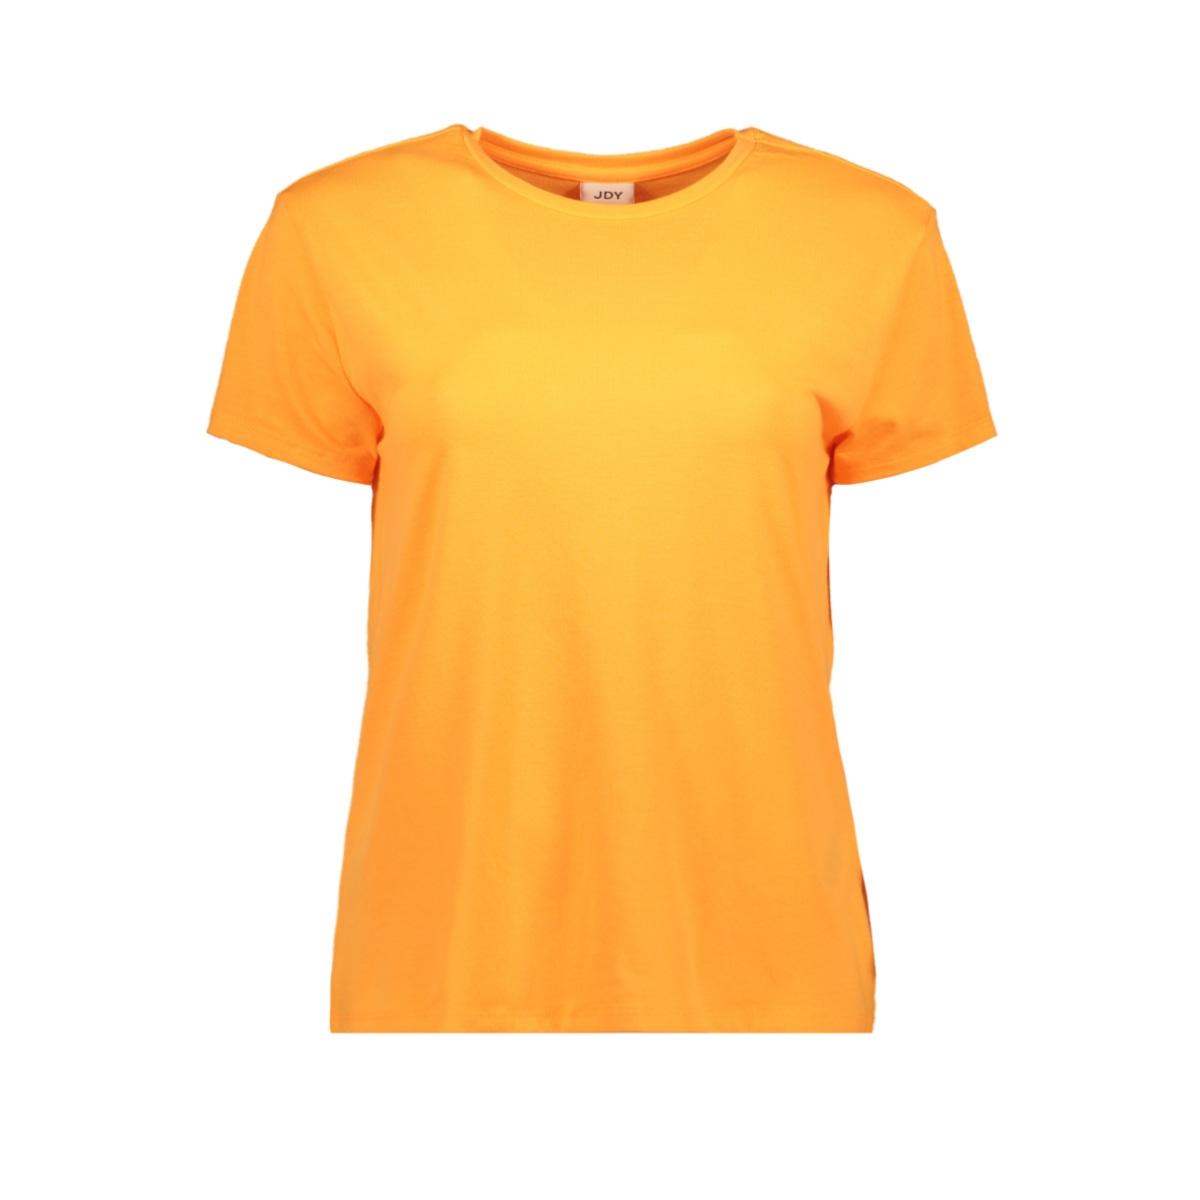 jdyniki s/s top jrs exp 15197546 jacqueline de yong t-shirt neon orange